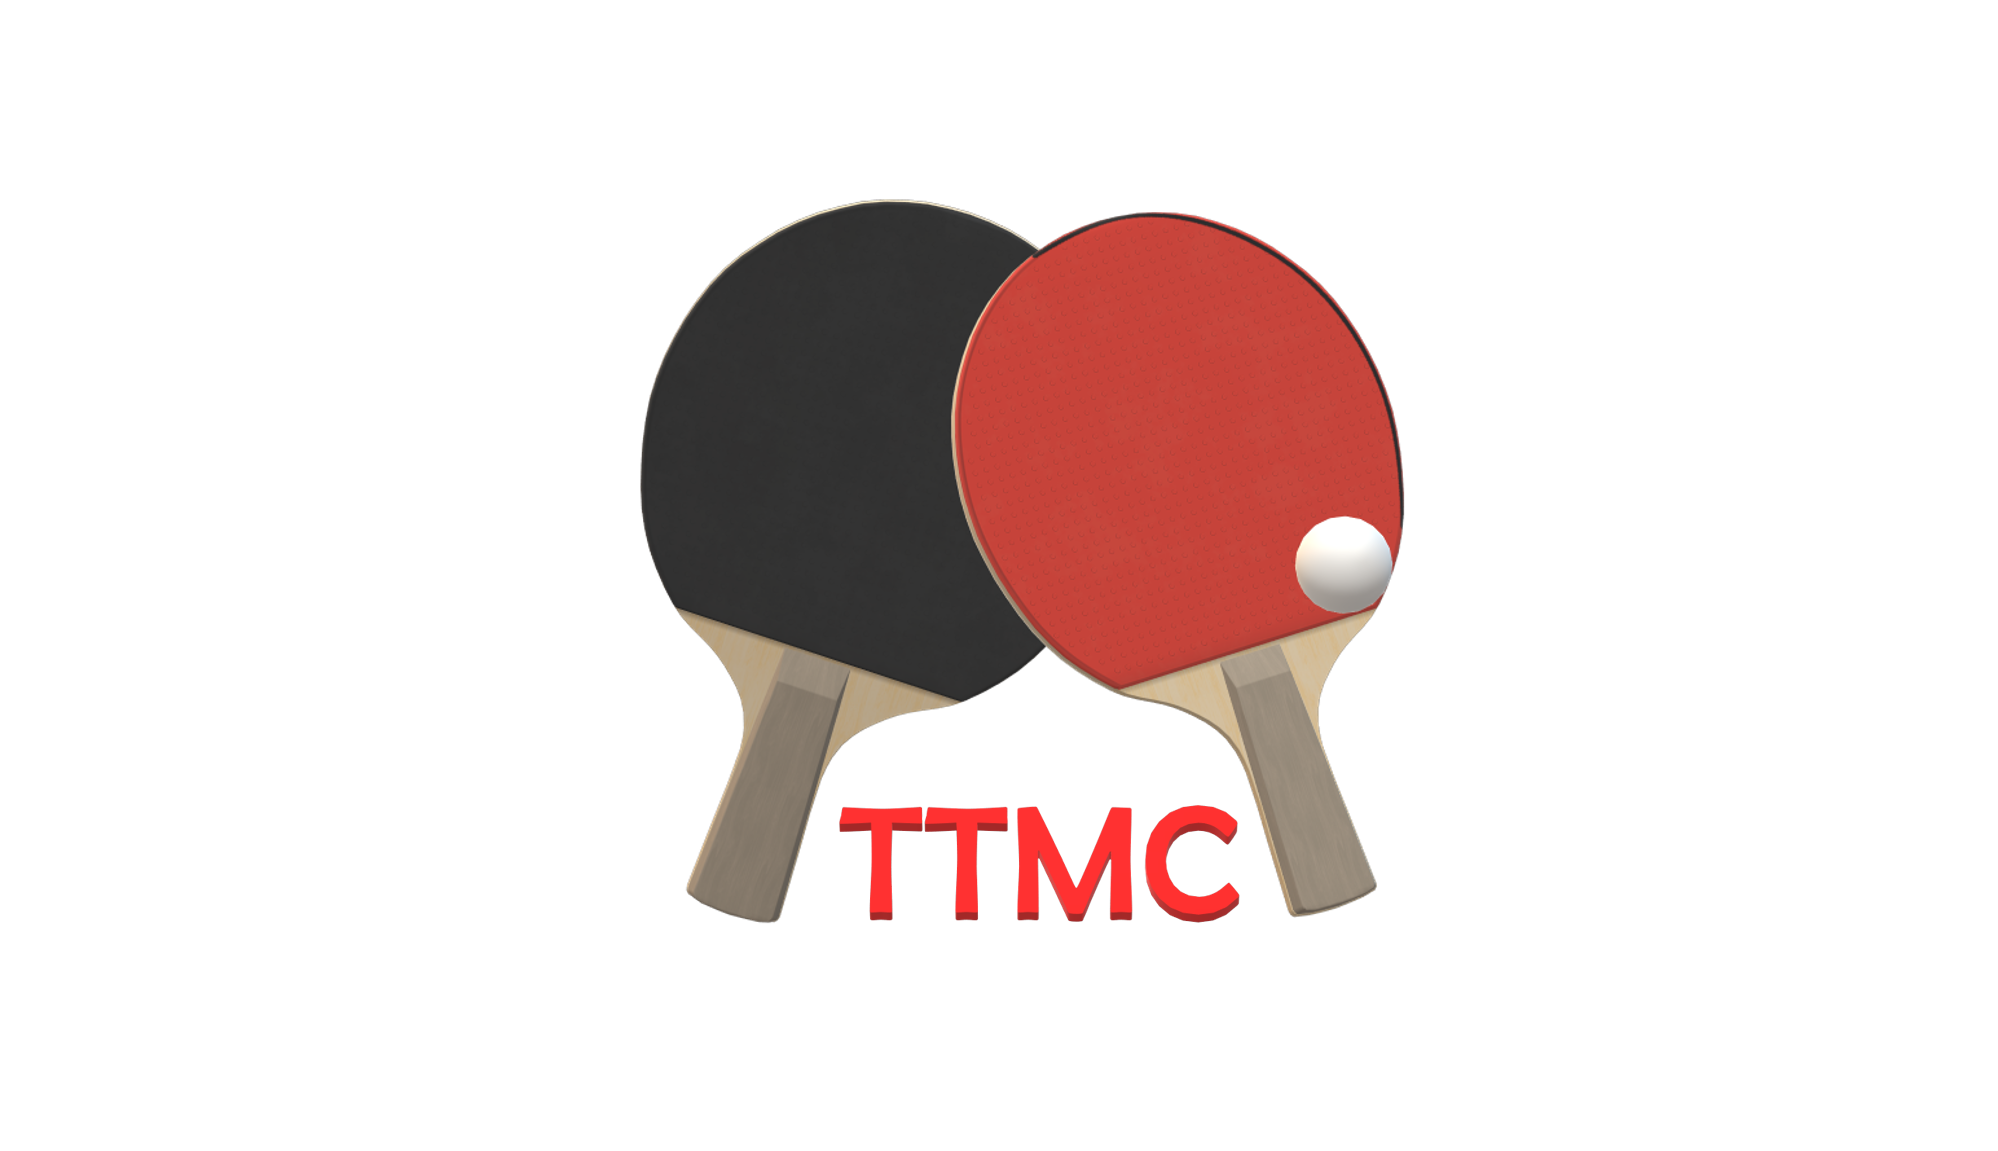 raquette-logo-TTMC-v3